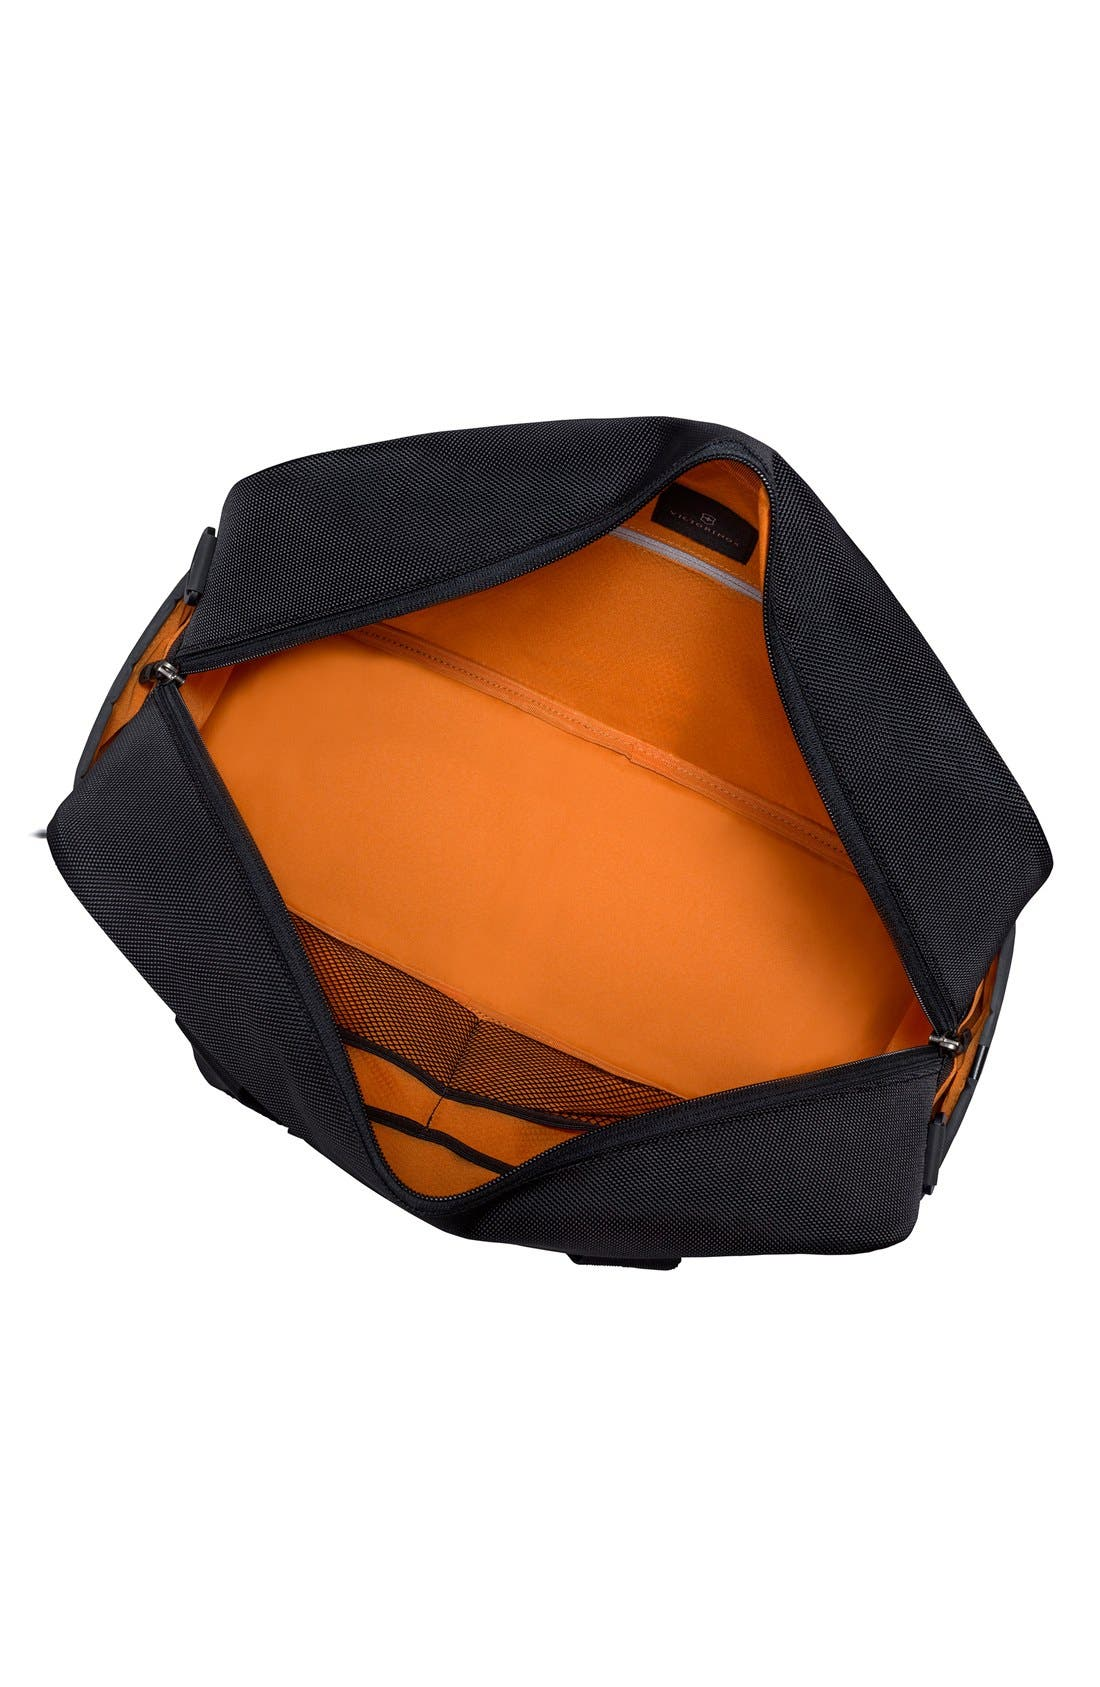 WT 5.0 Tote Bag,                             Alternate thumbnail 2, color,                             001